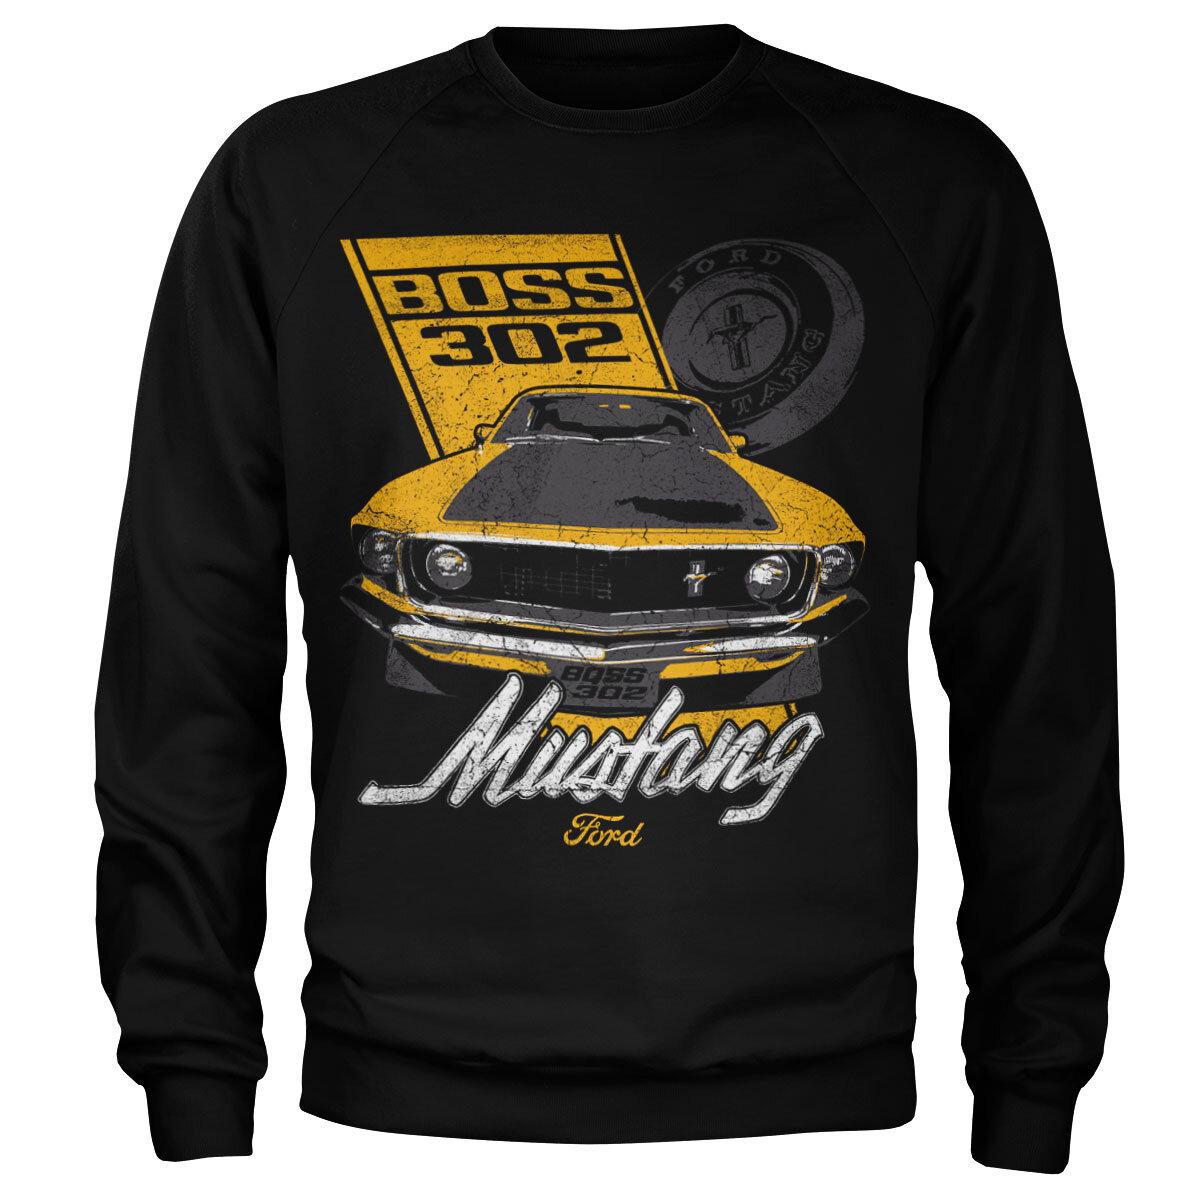 Ford Mustang BOSS 302 Sweatshirt